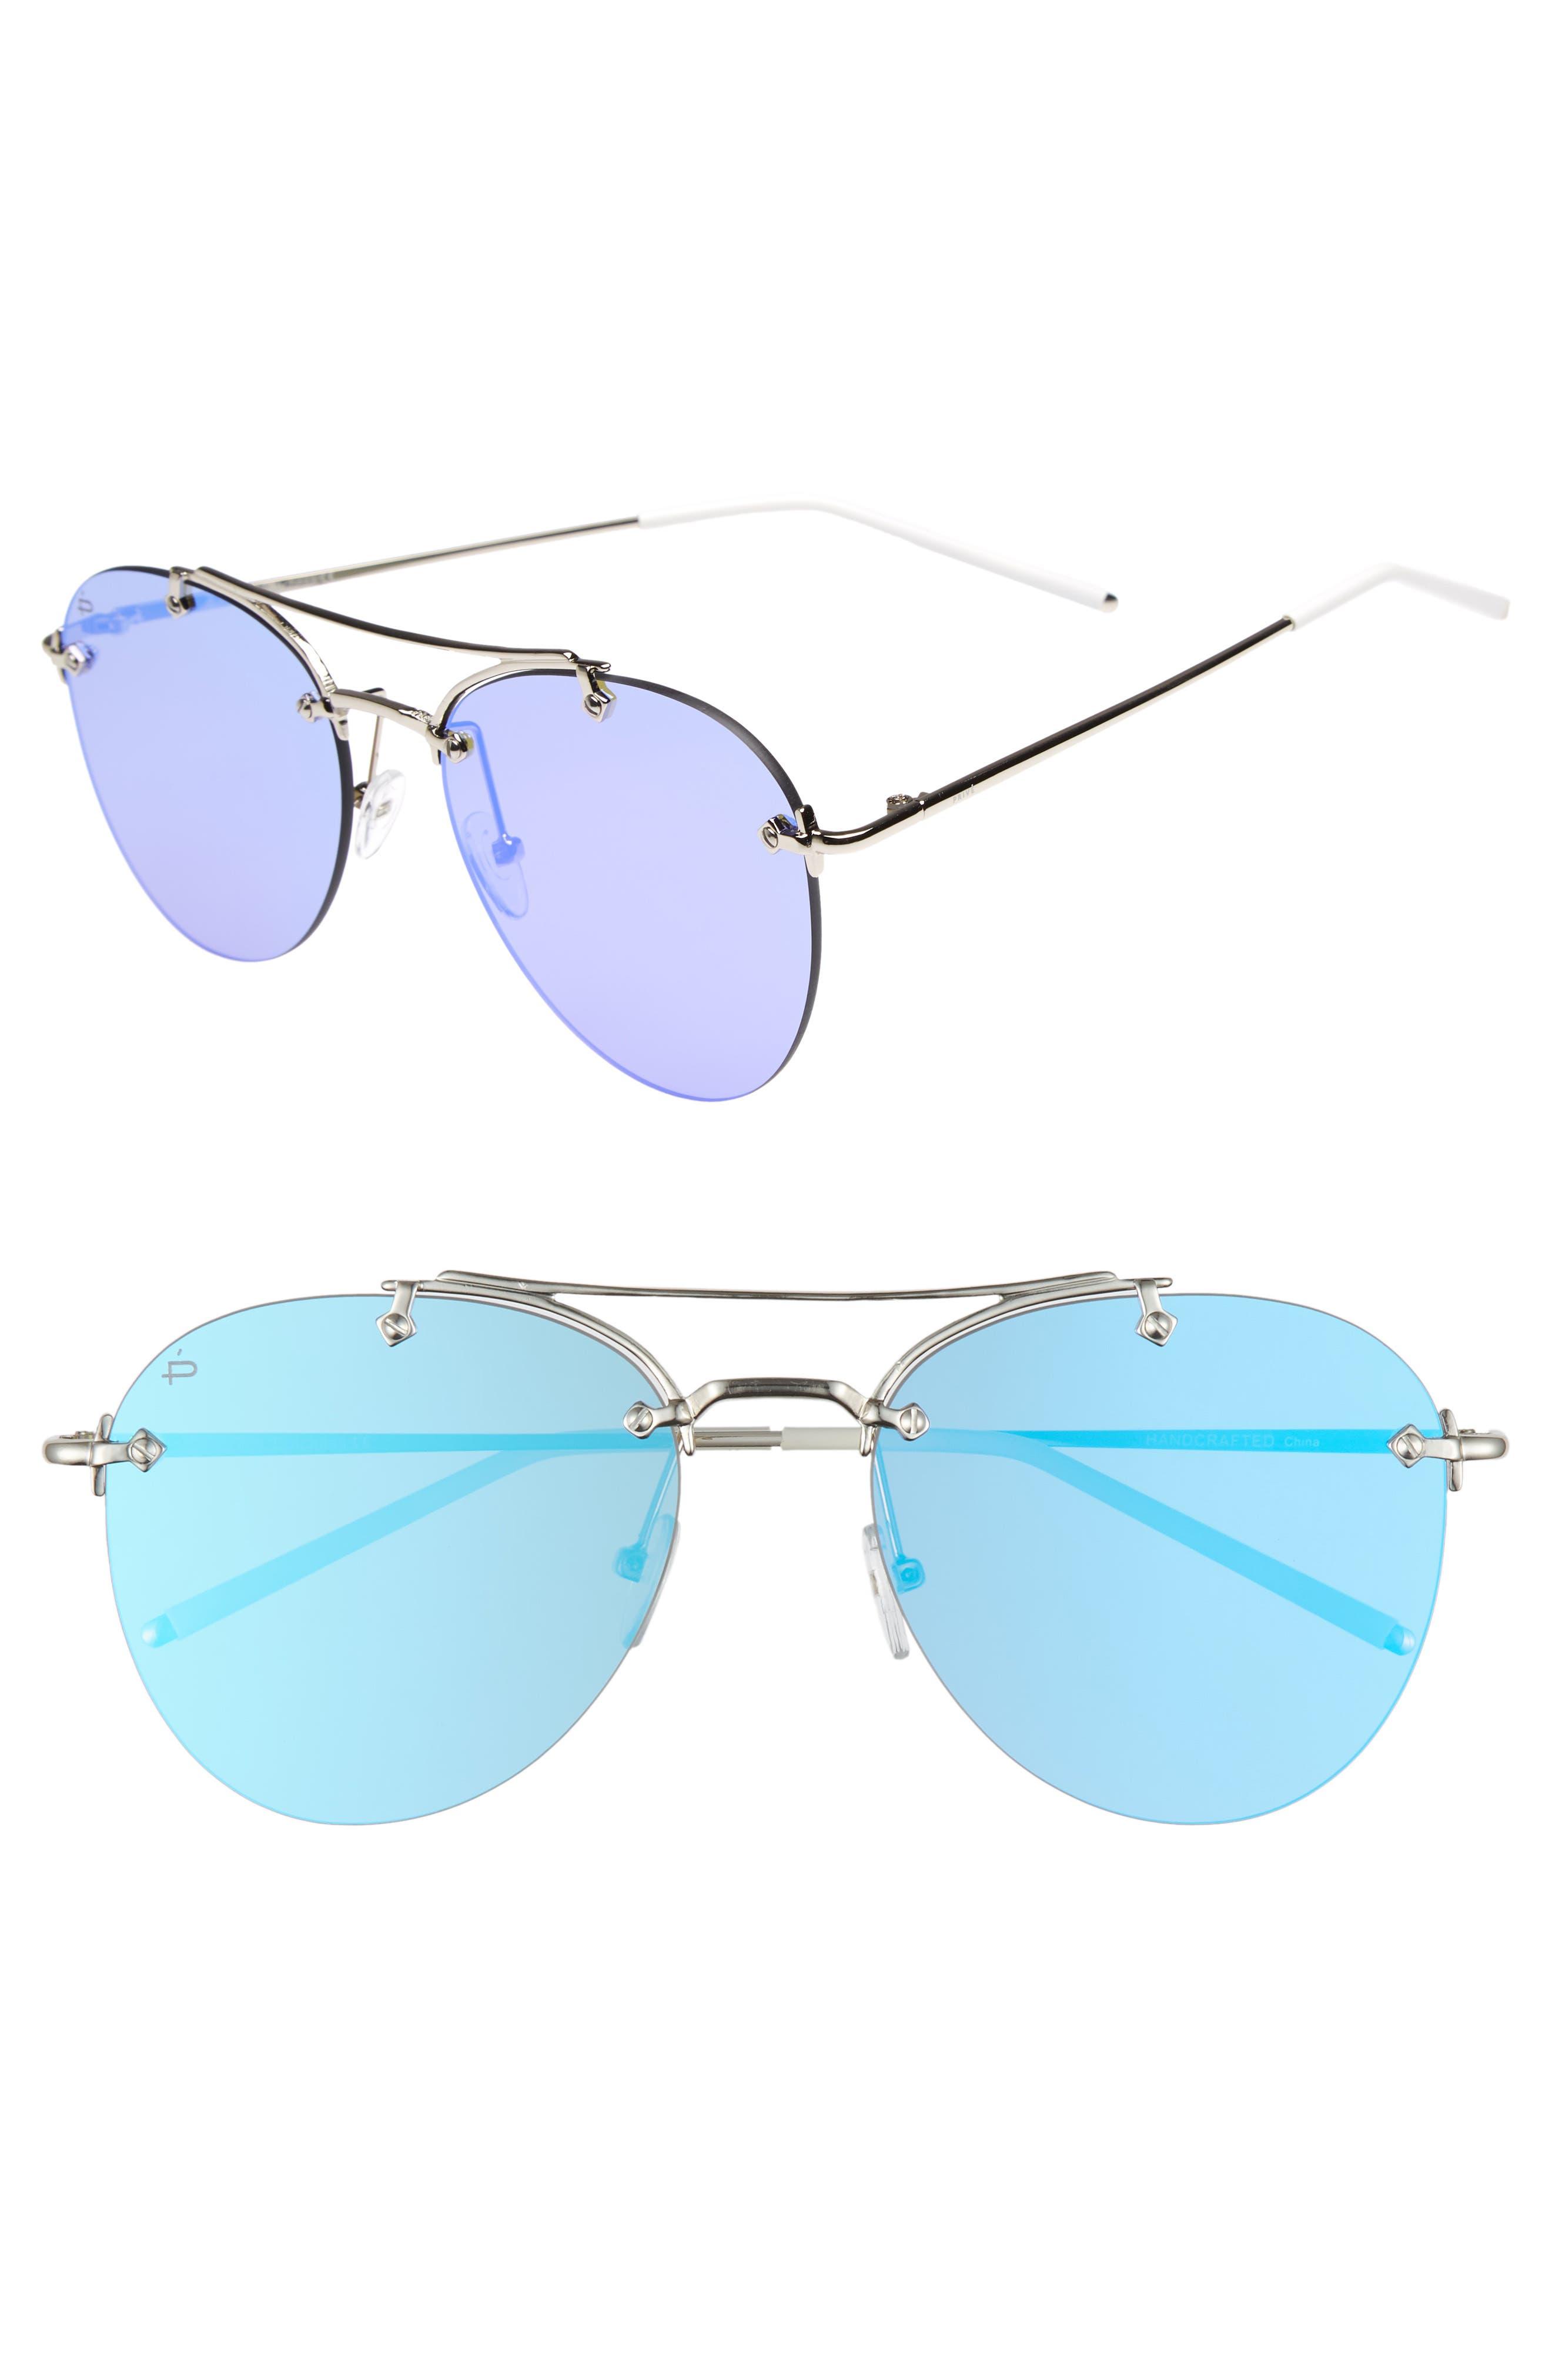 Privé Revaux The Dutchess 57mm Aviator Sunglasses,                         Main,                         color, Silver